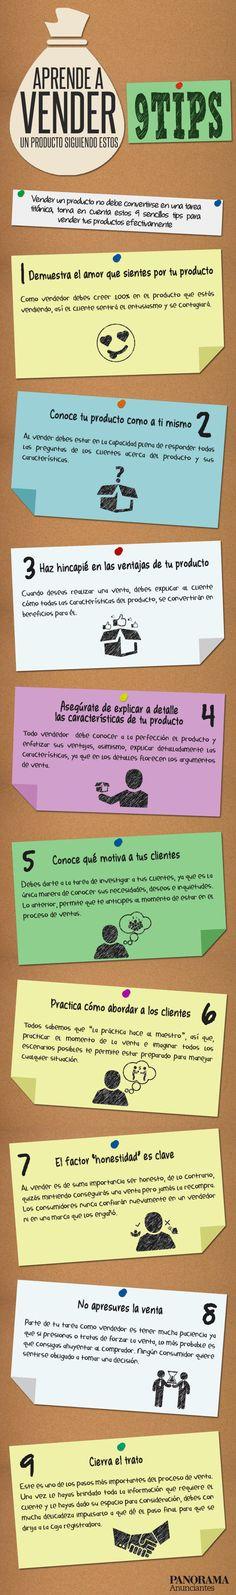 9 consejos para vender un producto #infografia